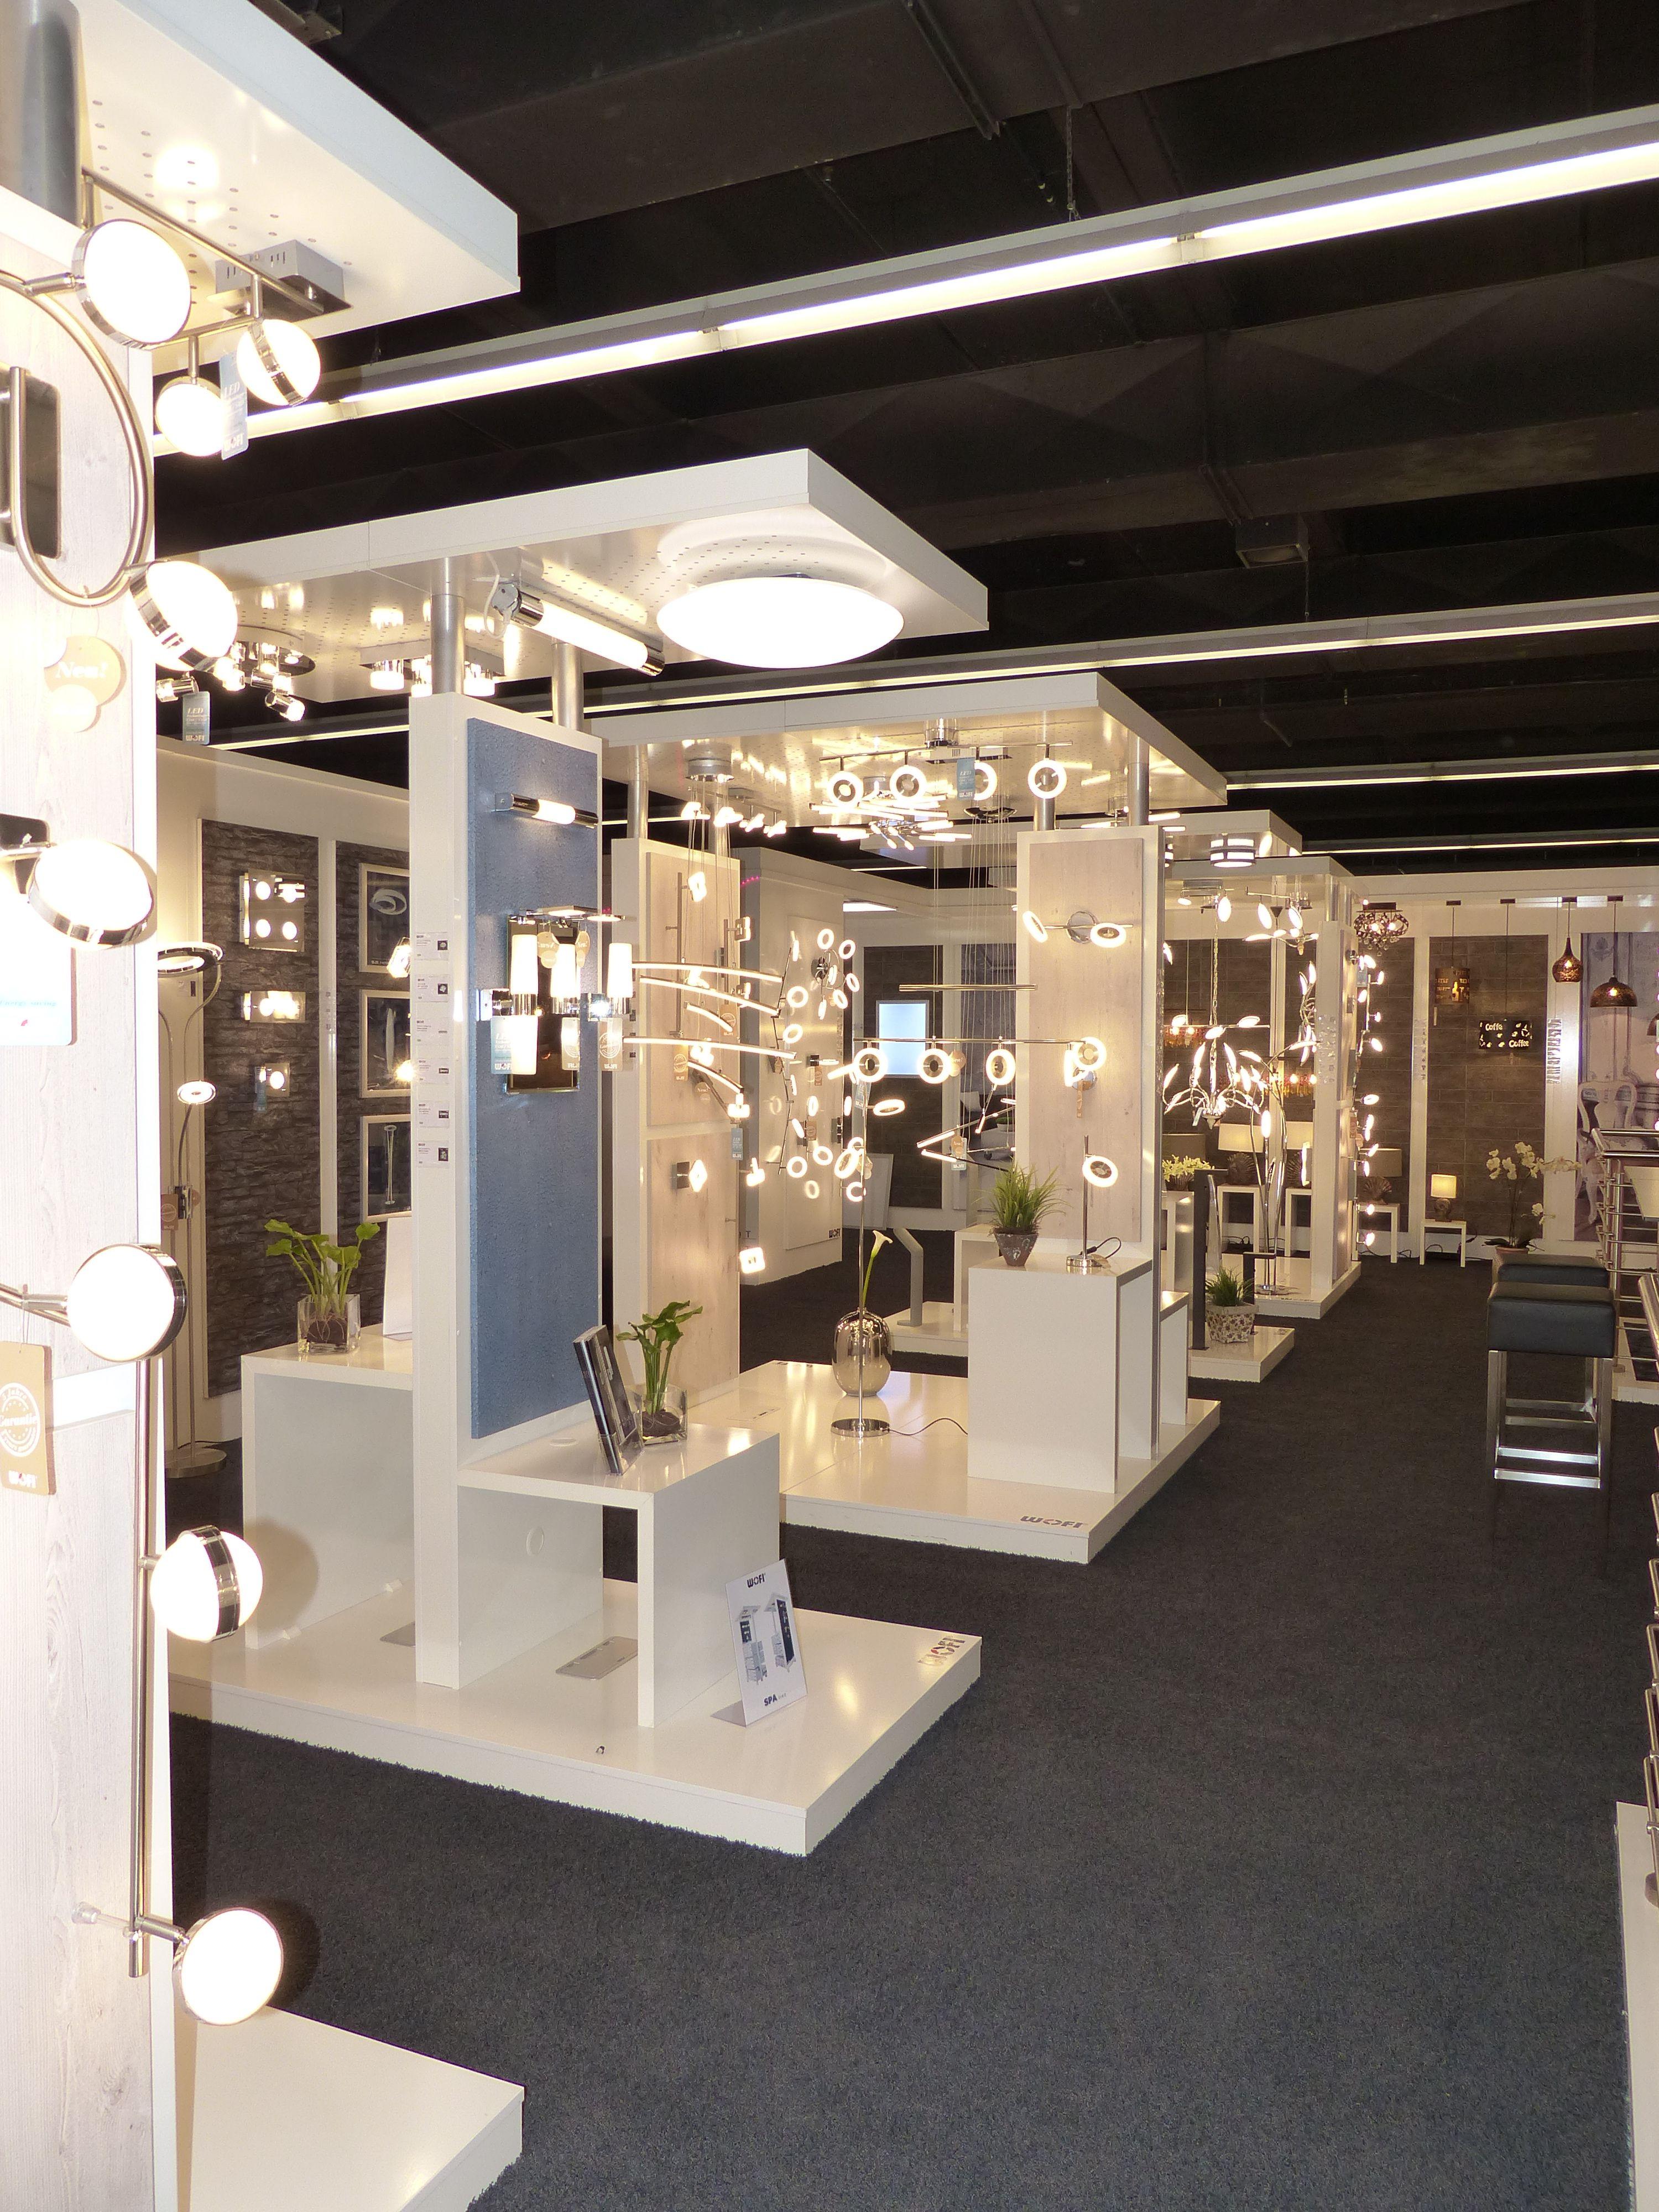 Light Walls And Contours Rgb Led Modulap System Fur Visuelle Kommunikation Leicht Mobil Fur Messe Architektur Promotion Led Be Messestand Design Messestand Und Design